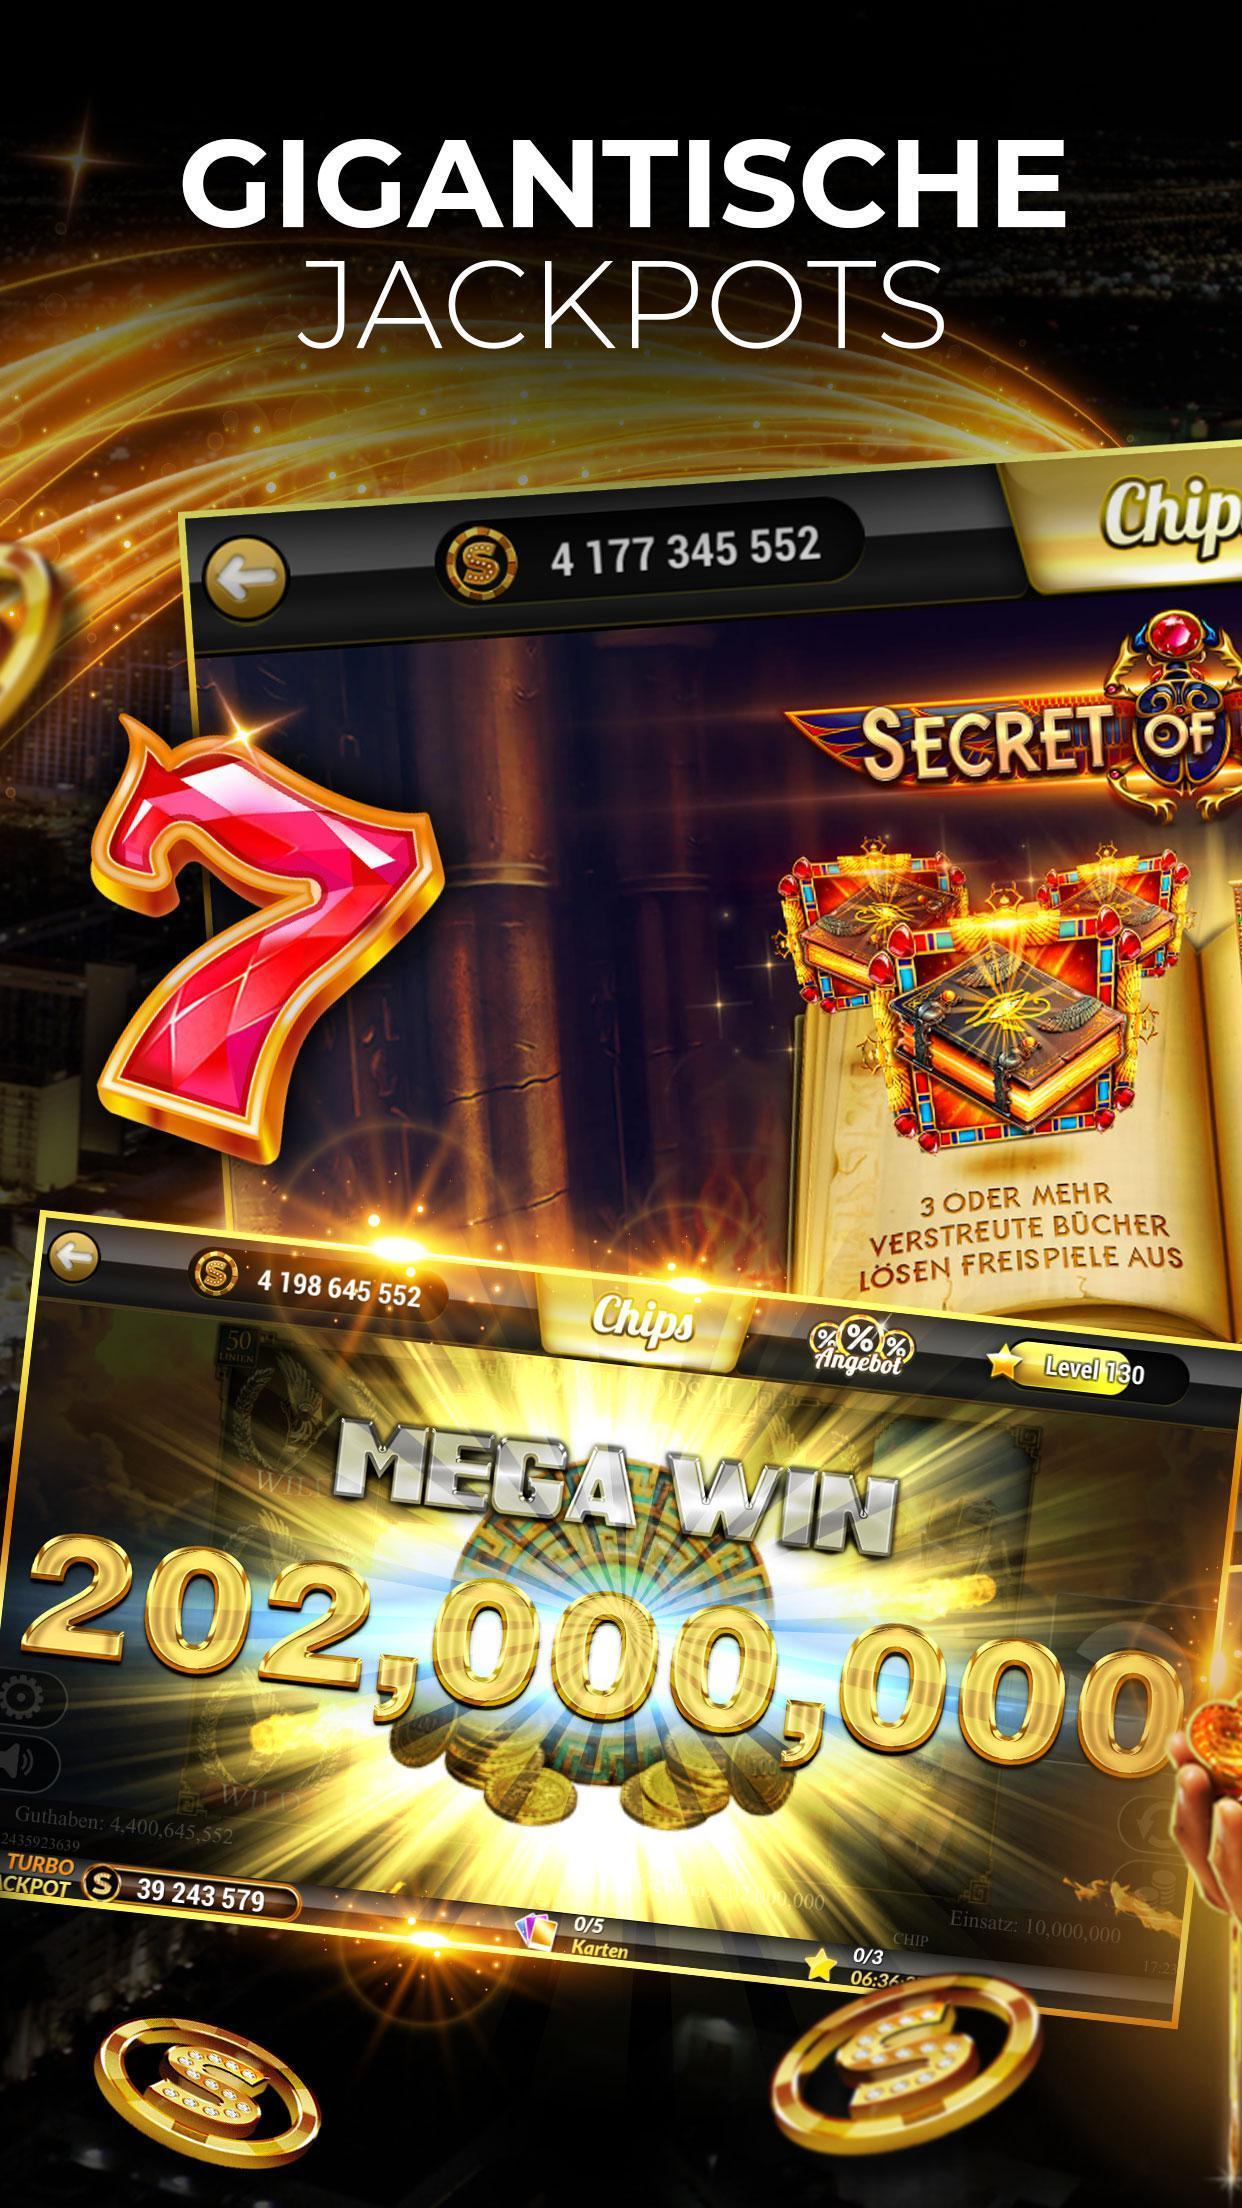 Slotigo Online-Casino, Spielautomaten & Jackpots 4.11.11 Screenshot 4